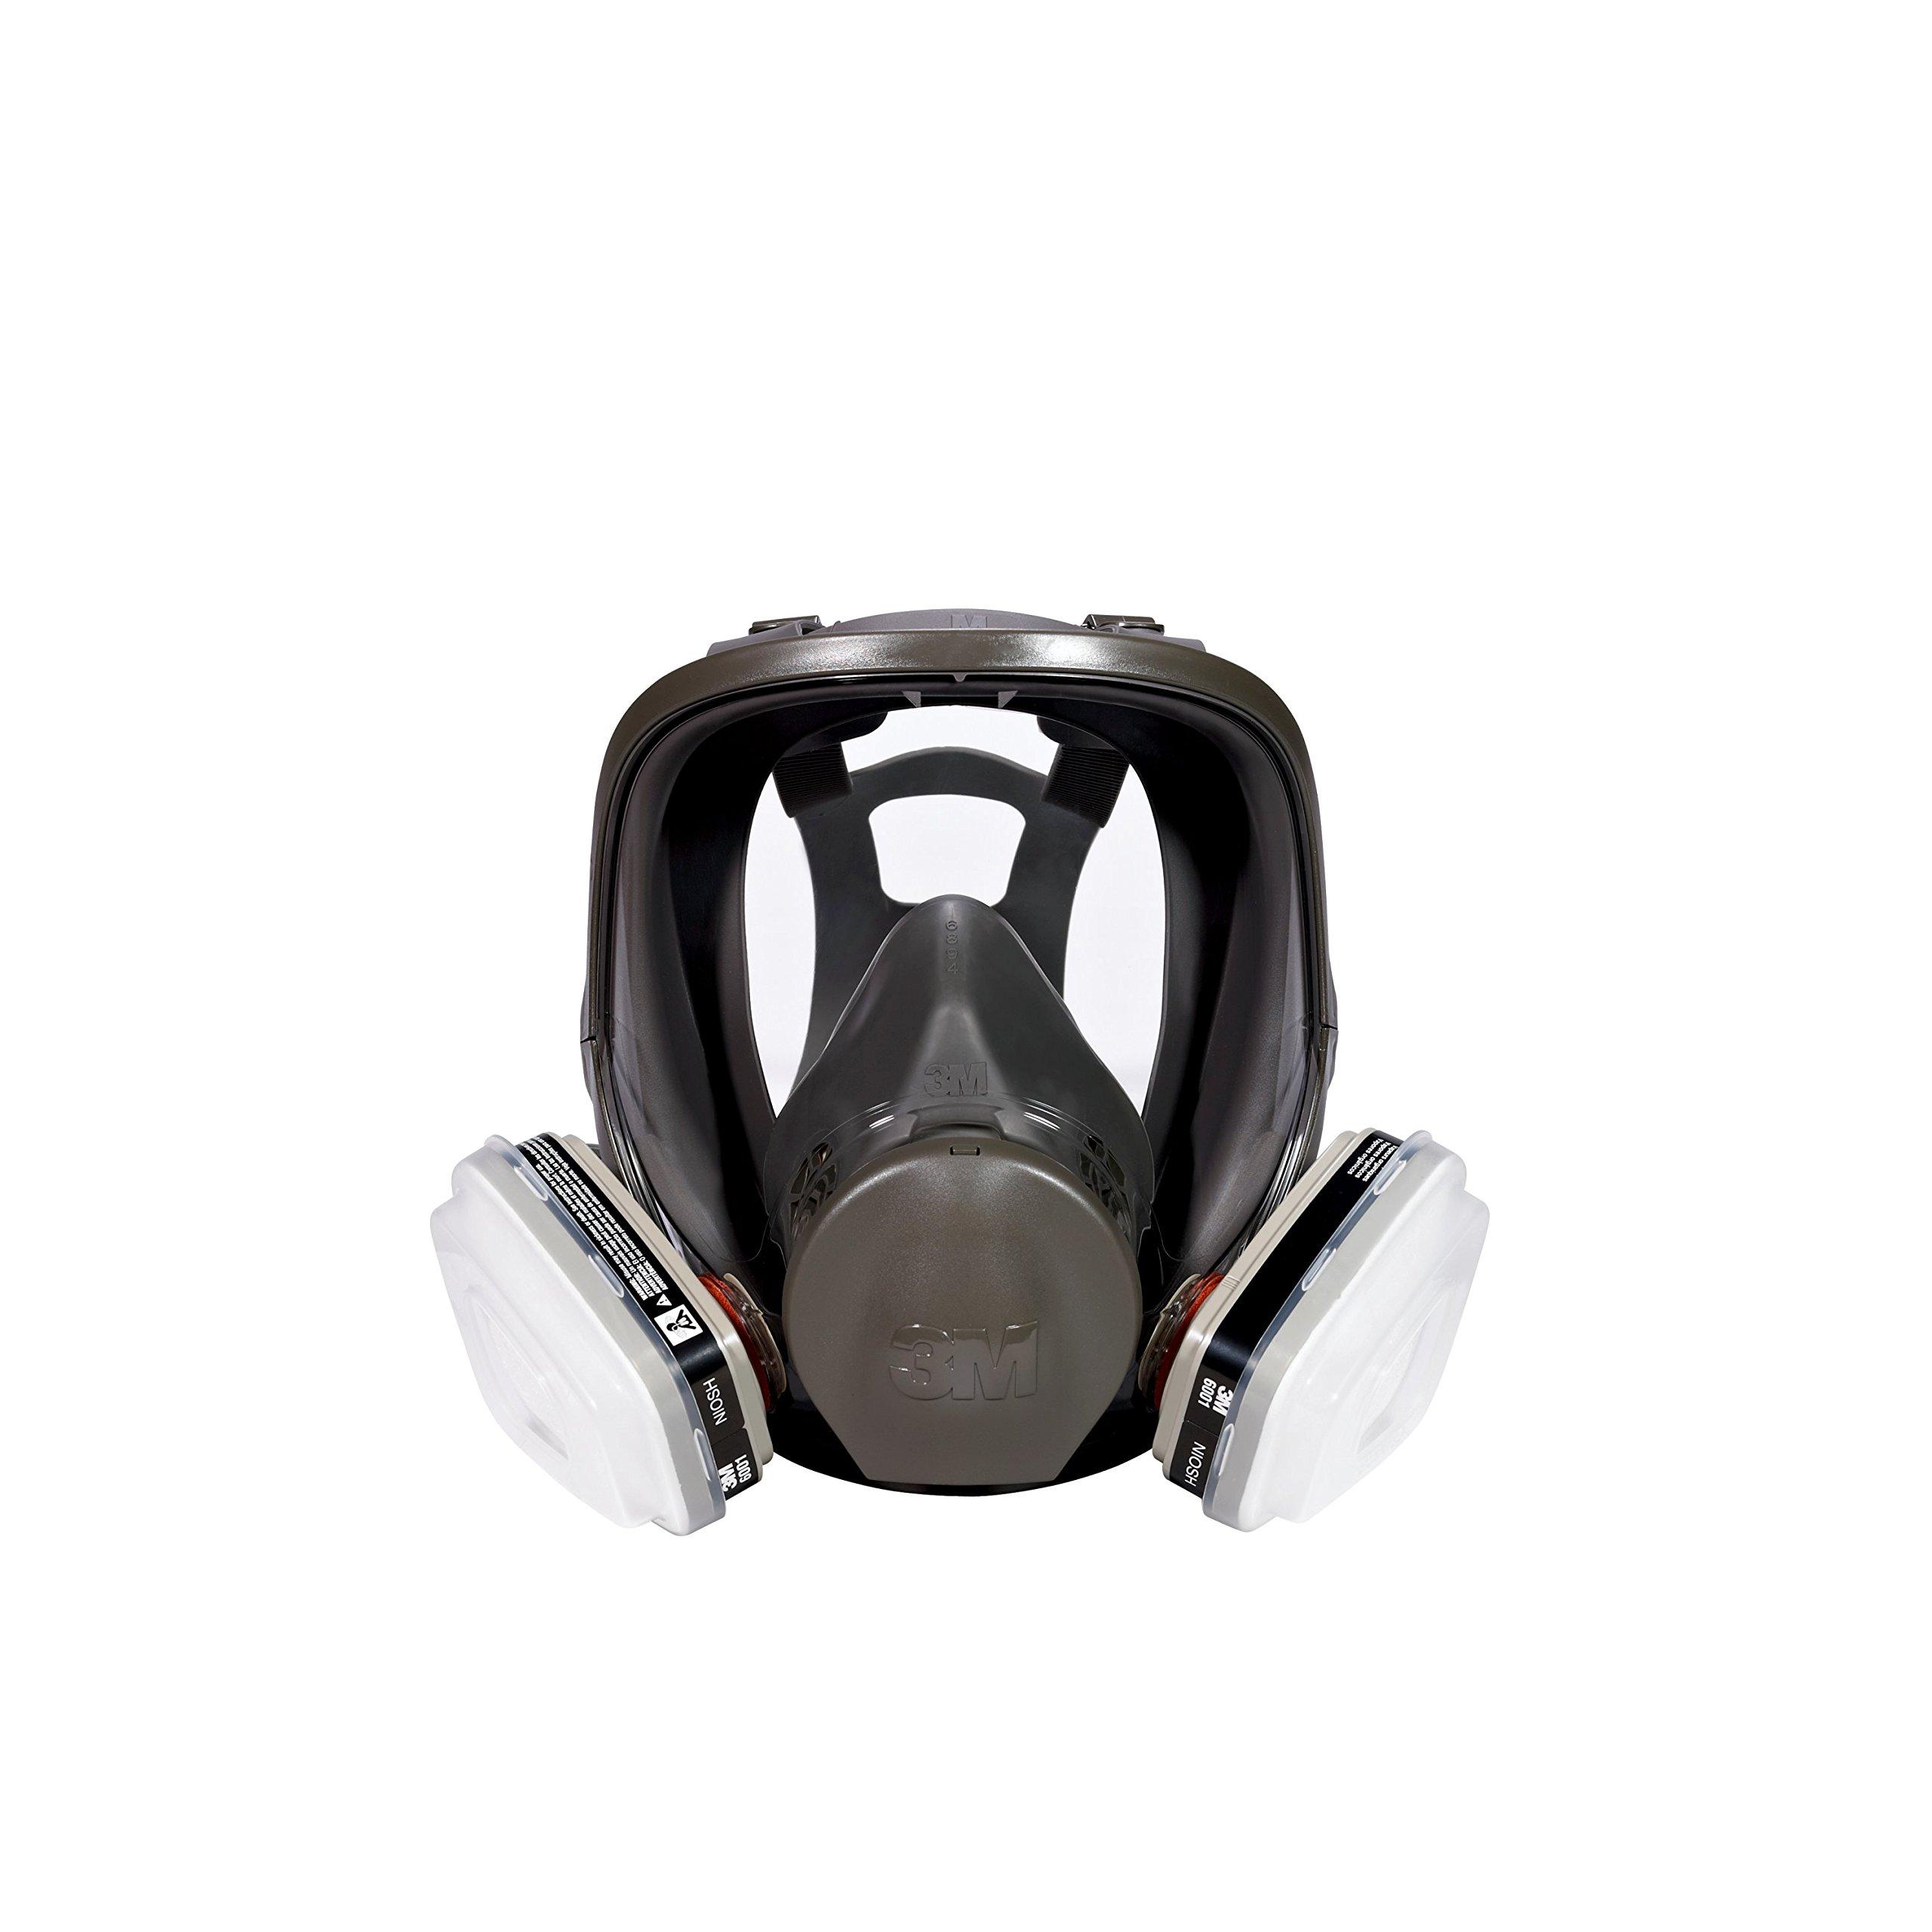 3M Full Face Paint Project Respirator, Medium